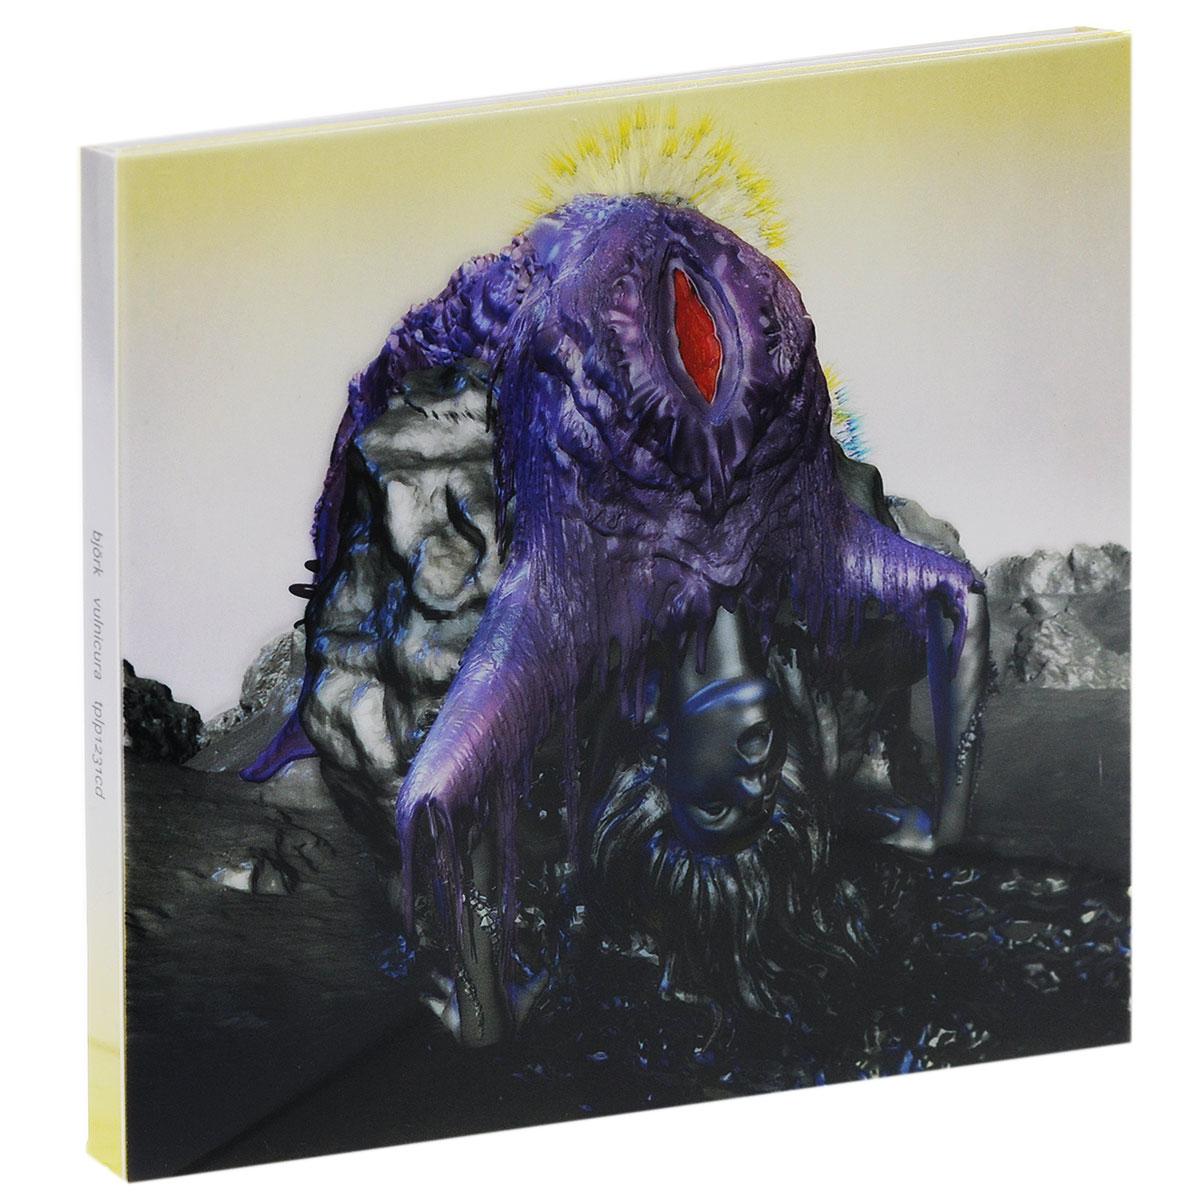 Bjork. Vulnicura. Deluxe Edition 2015 Audio CD